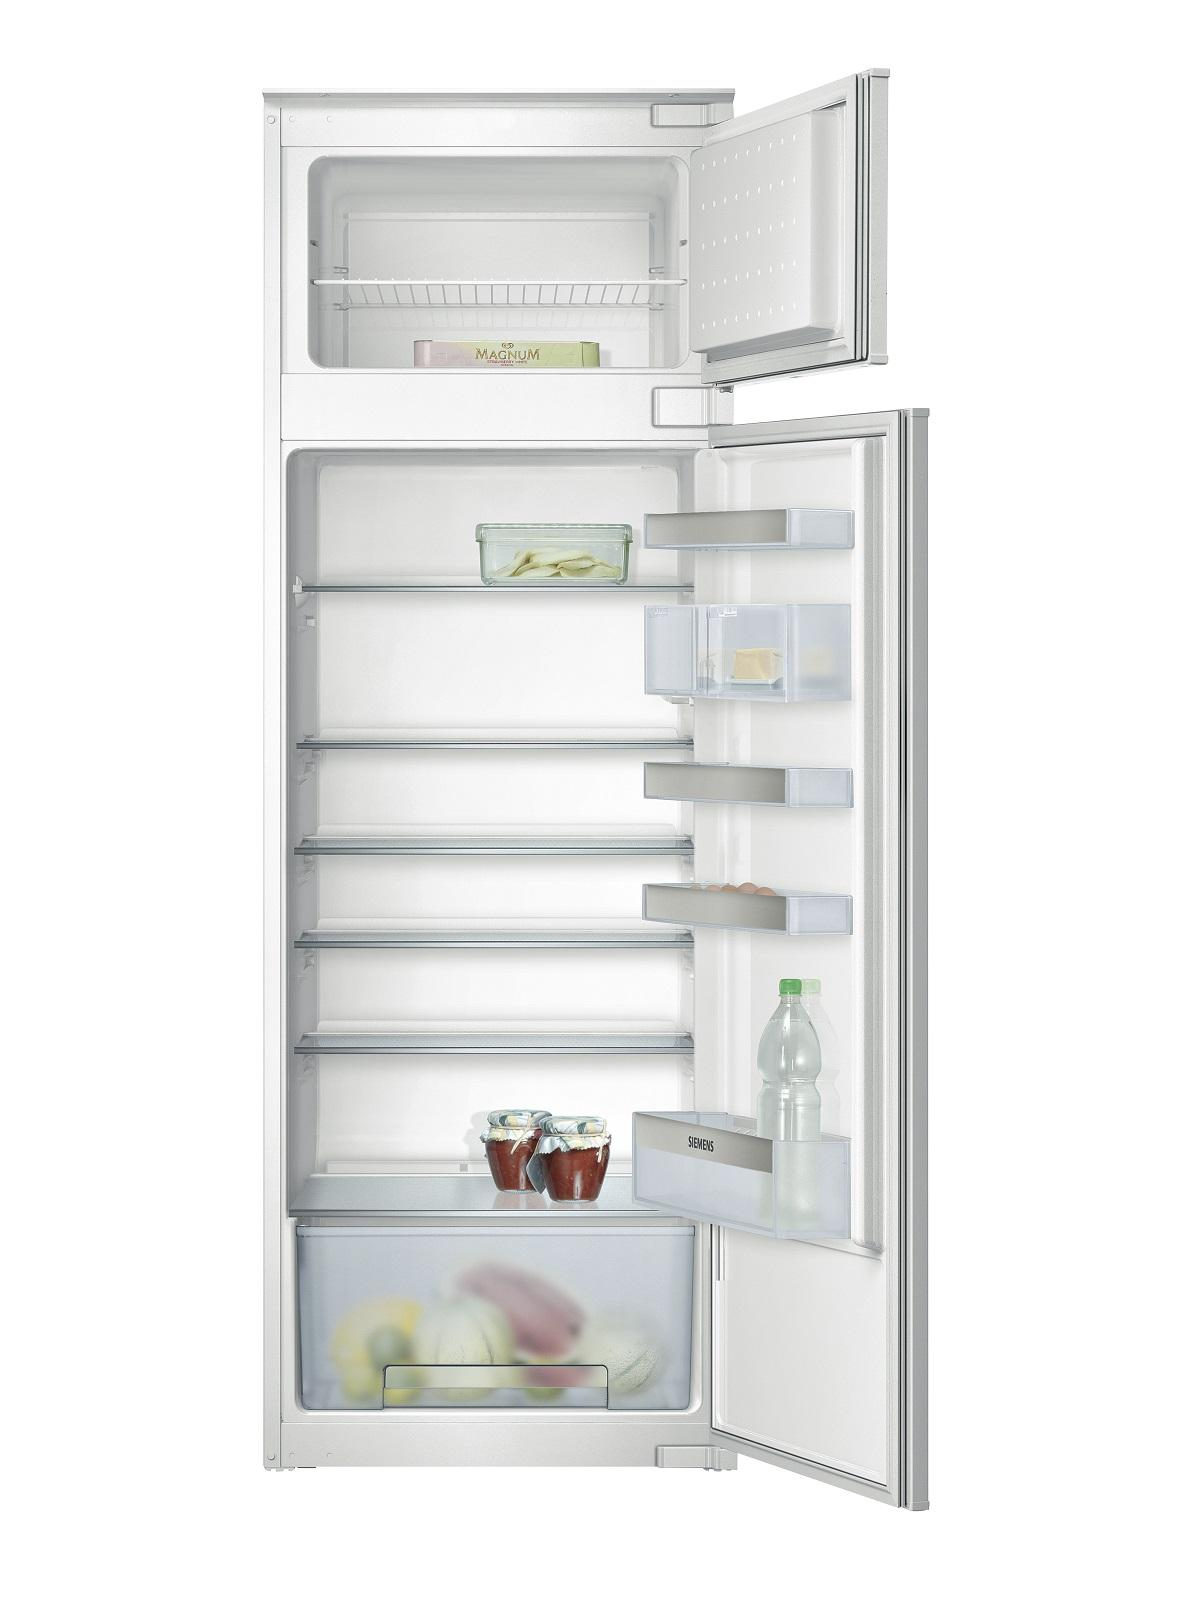 i comuni frigoriferi doppia porta da incasso per stivare. Black Bedroom Furniture Sets. Home Design Ideas